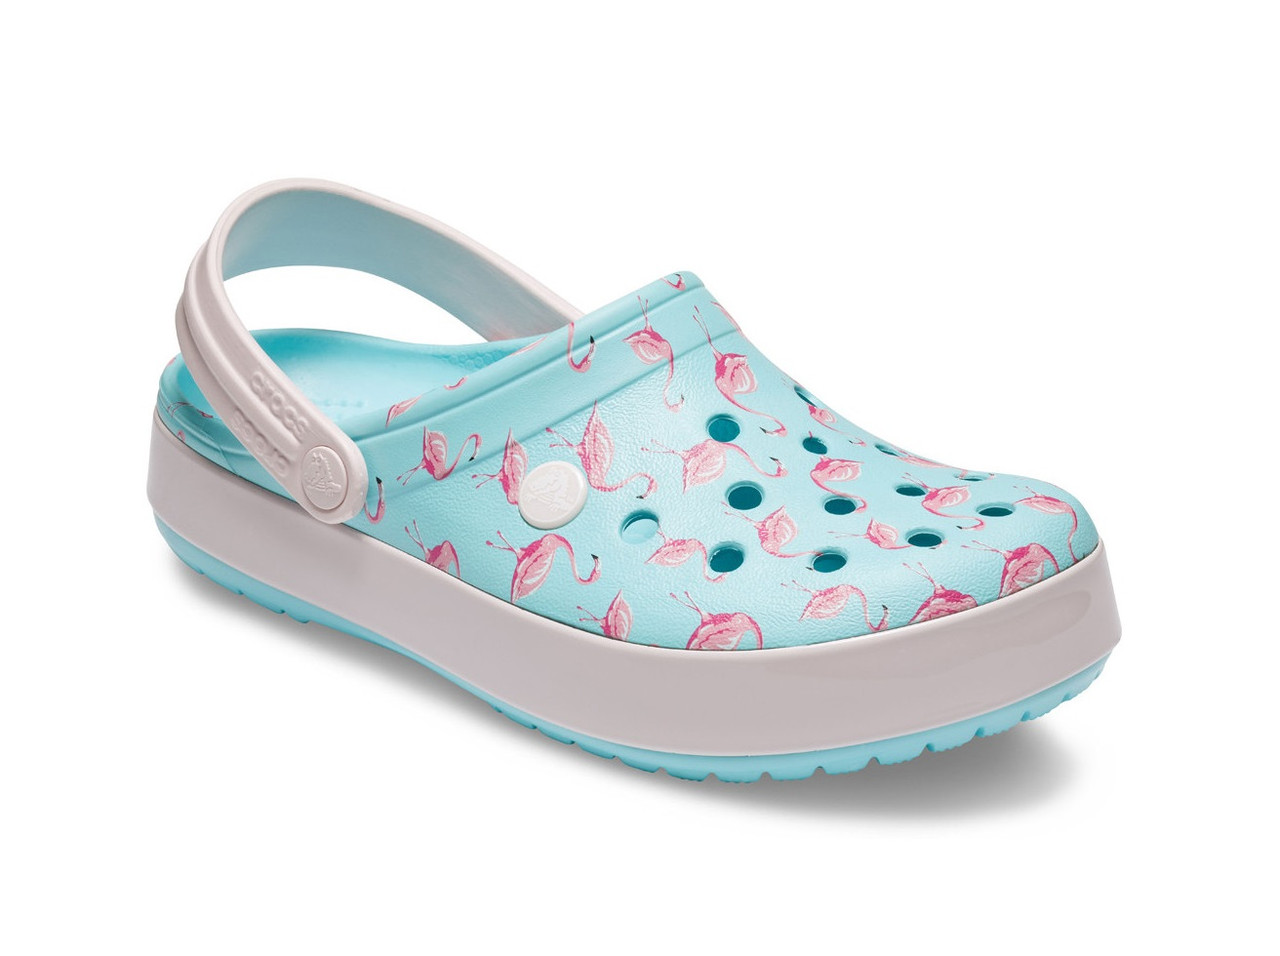 CROCS Crocband™ Seasonal Graphic Clog Ice Blue / Pink Женские Кроксы Сабо